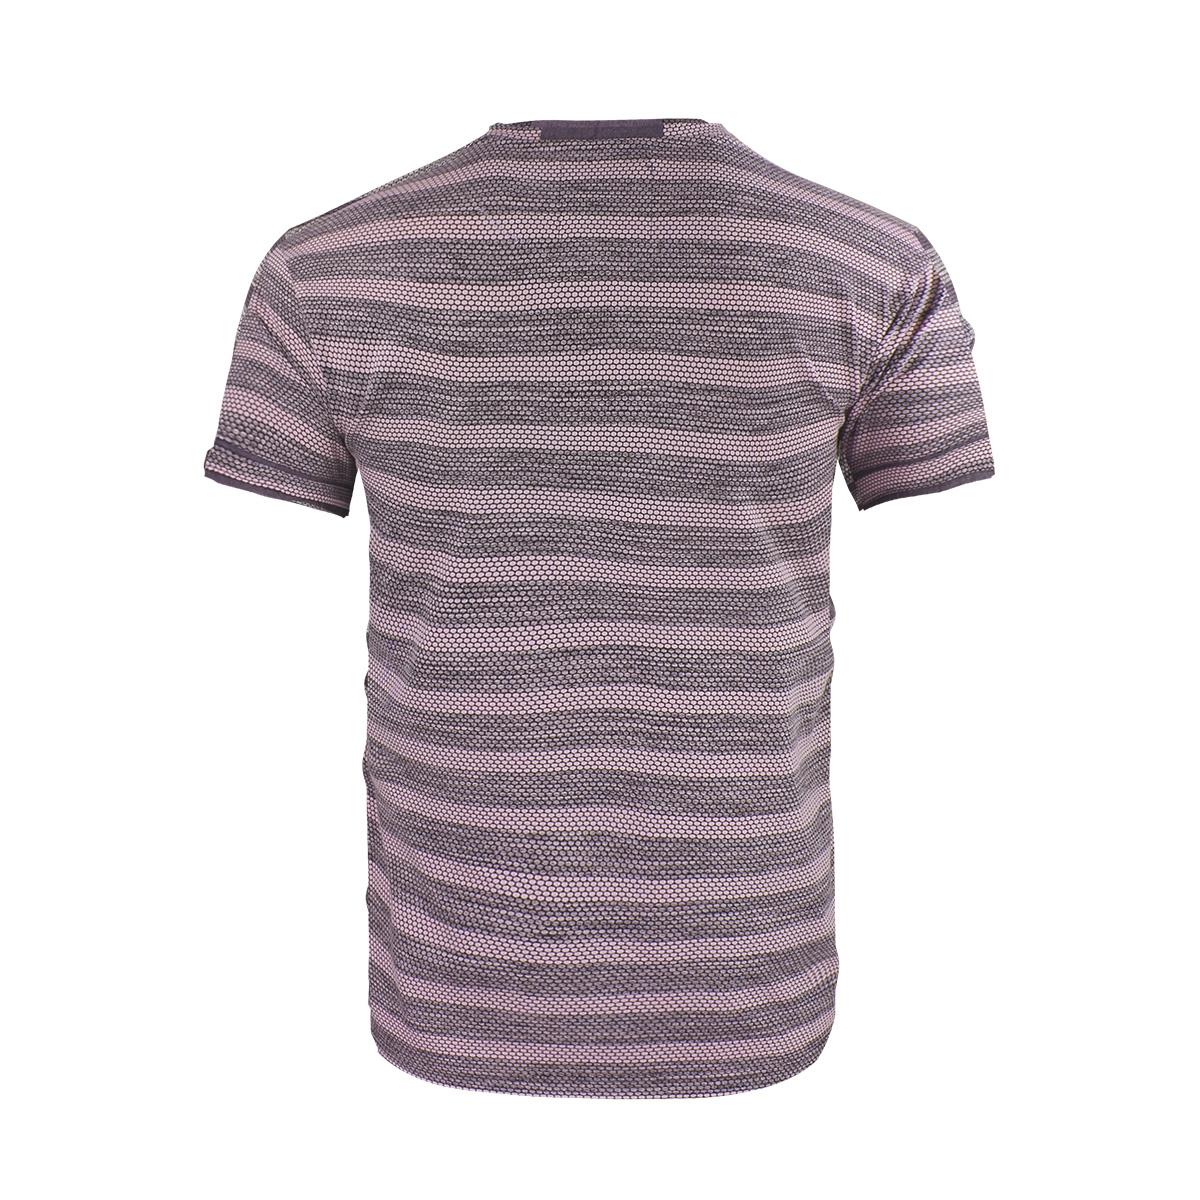 15126 gabbiano t-shirt pink